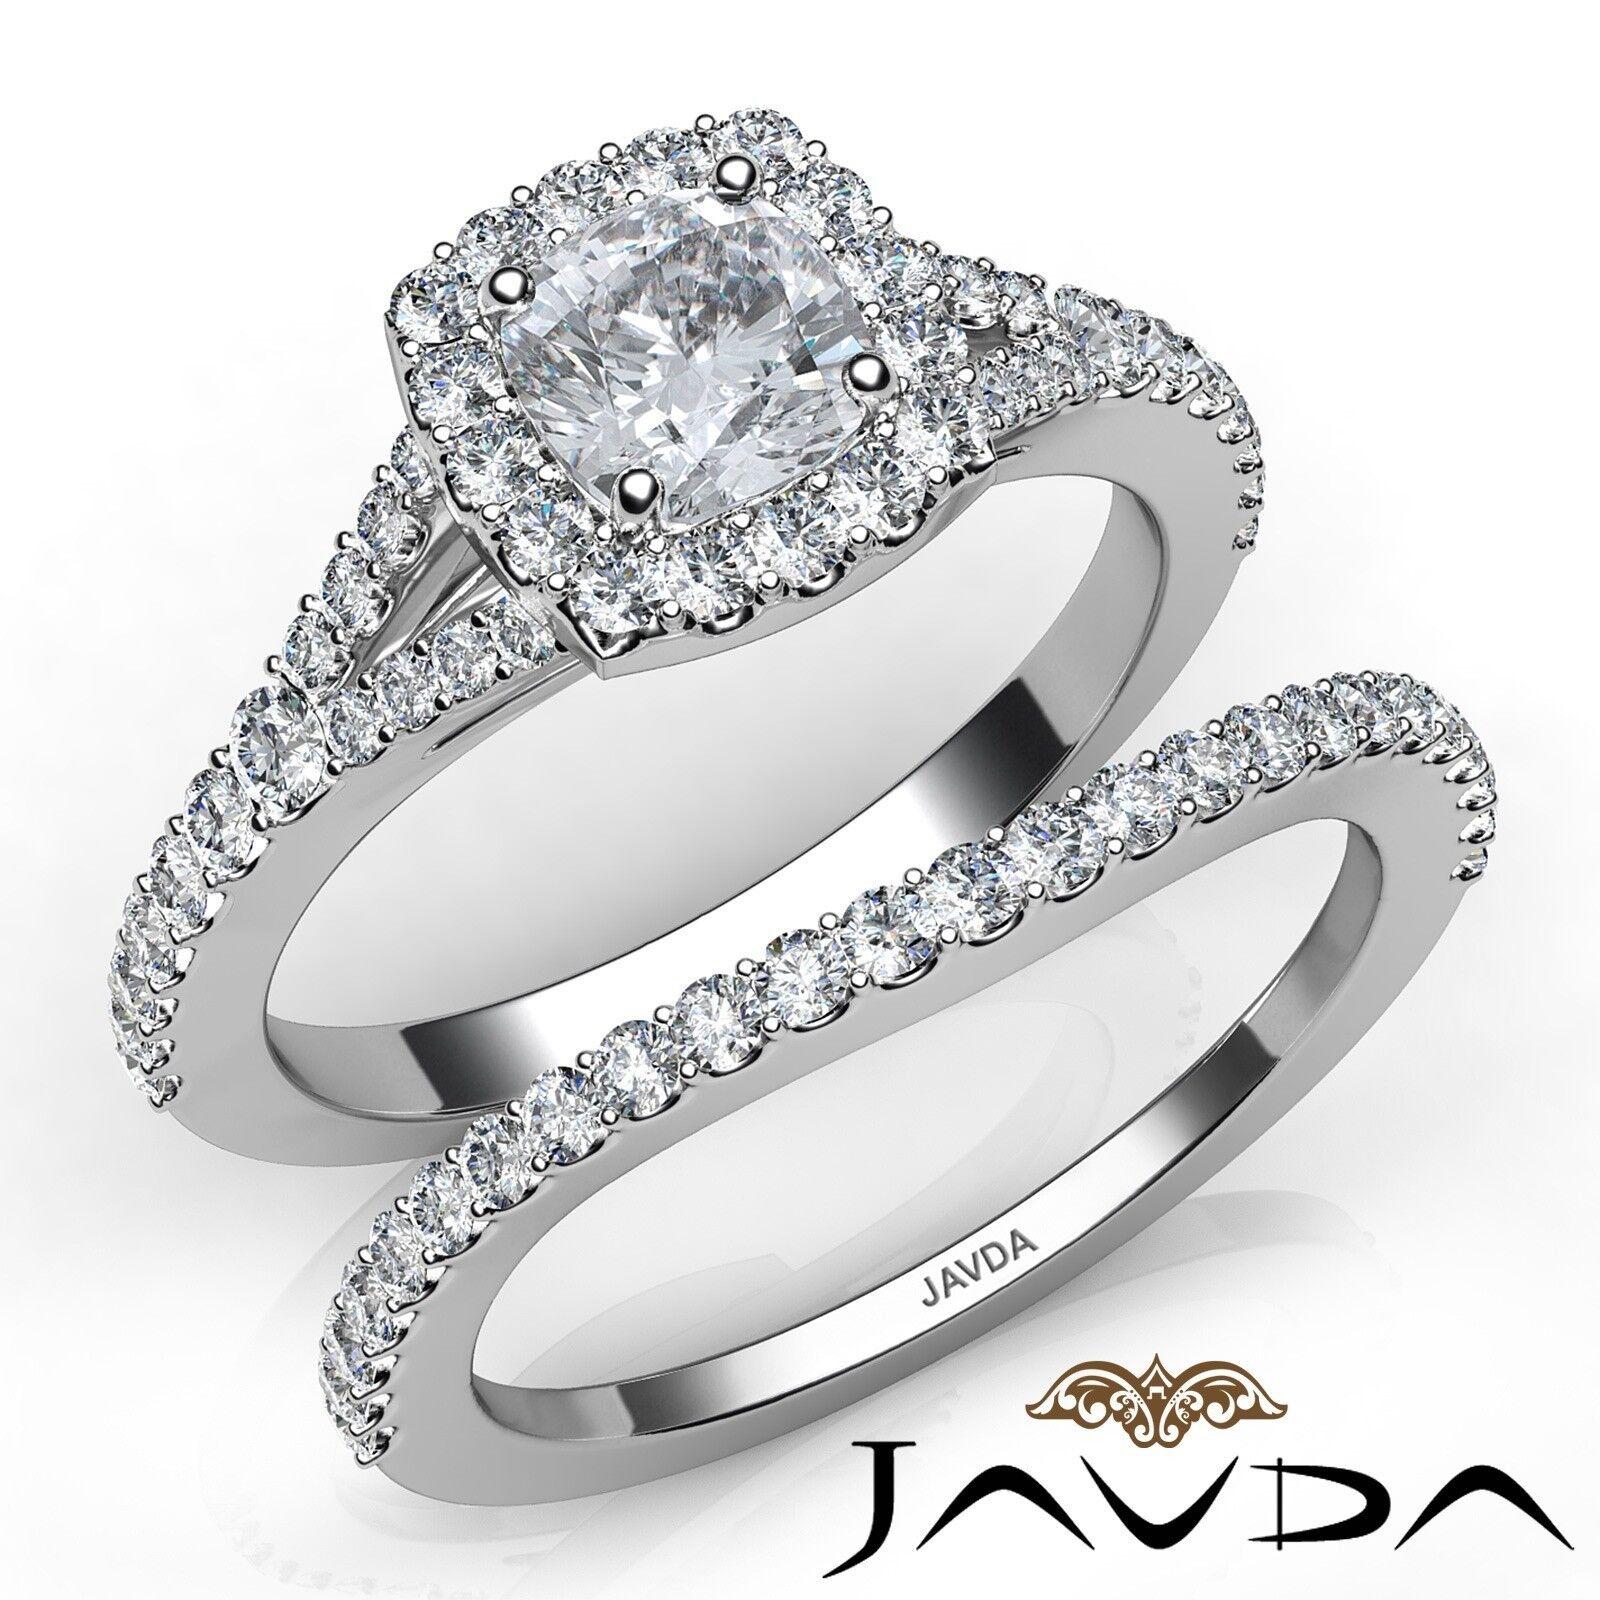 1.55ctw U Cut Pave Halo Bridal Cushion Diamond Engagement Ring GIA F-VVS2 W Gold